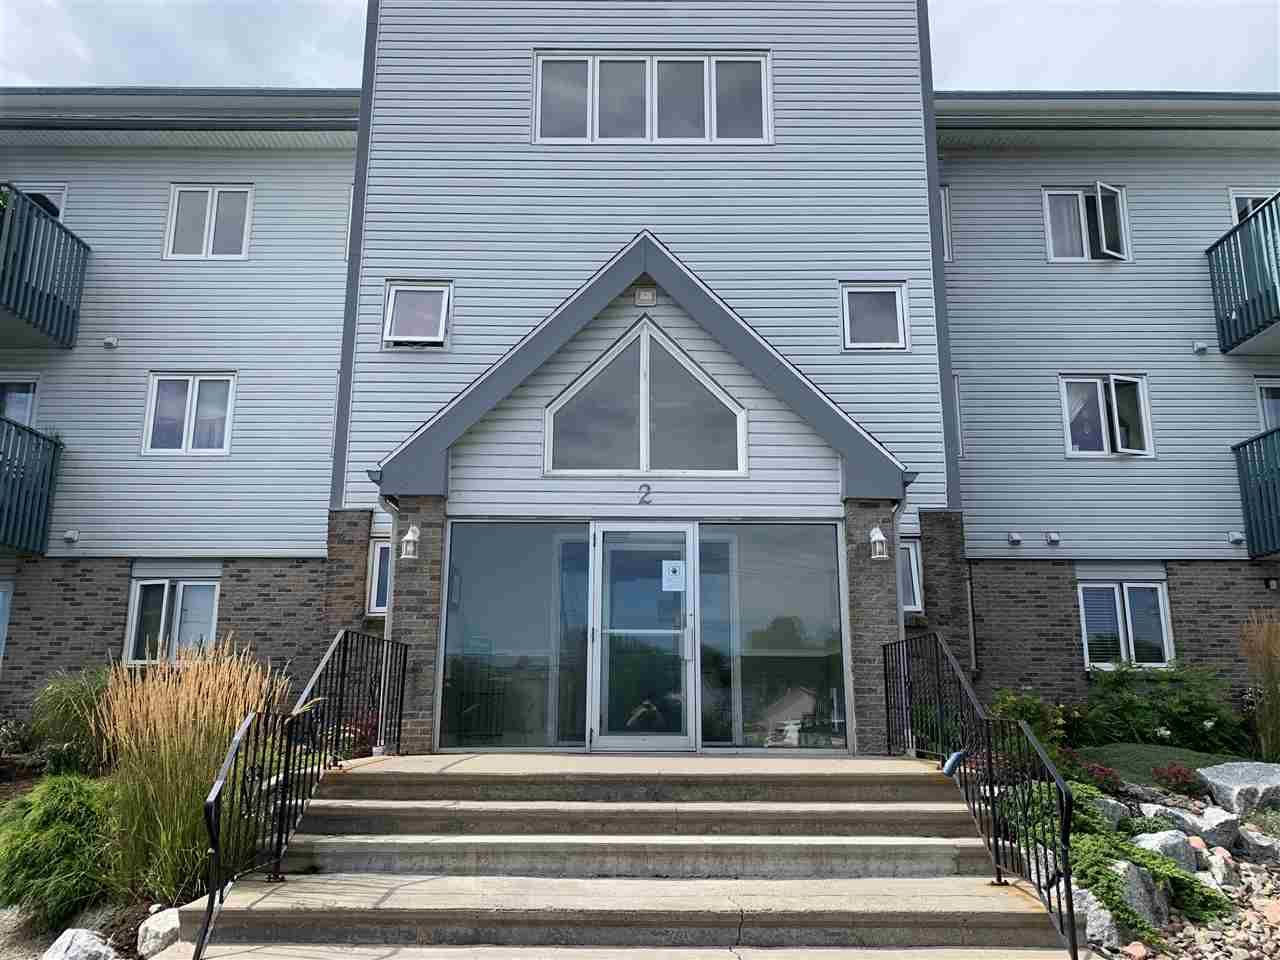 Main Photo: 300 2 Lombardy Lane in Dartmouth: 14-Dartmouth Montebello, Port Wallis, Keystone Residential for sale (Halifax-Dartmouth)  : MLS®# 202018075